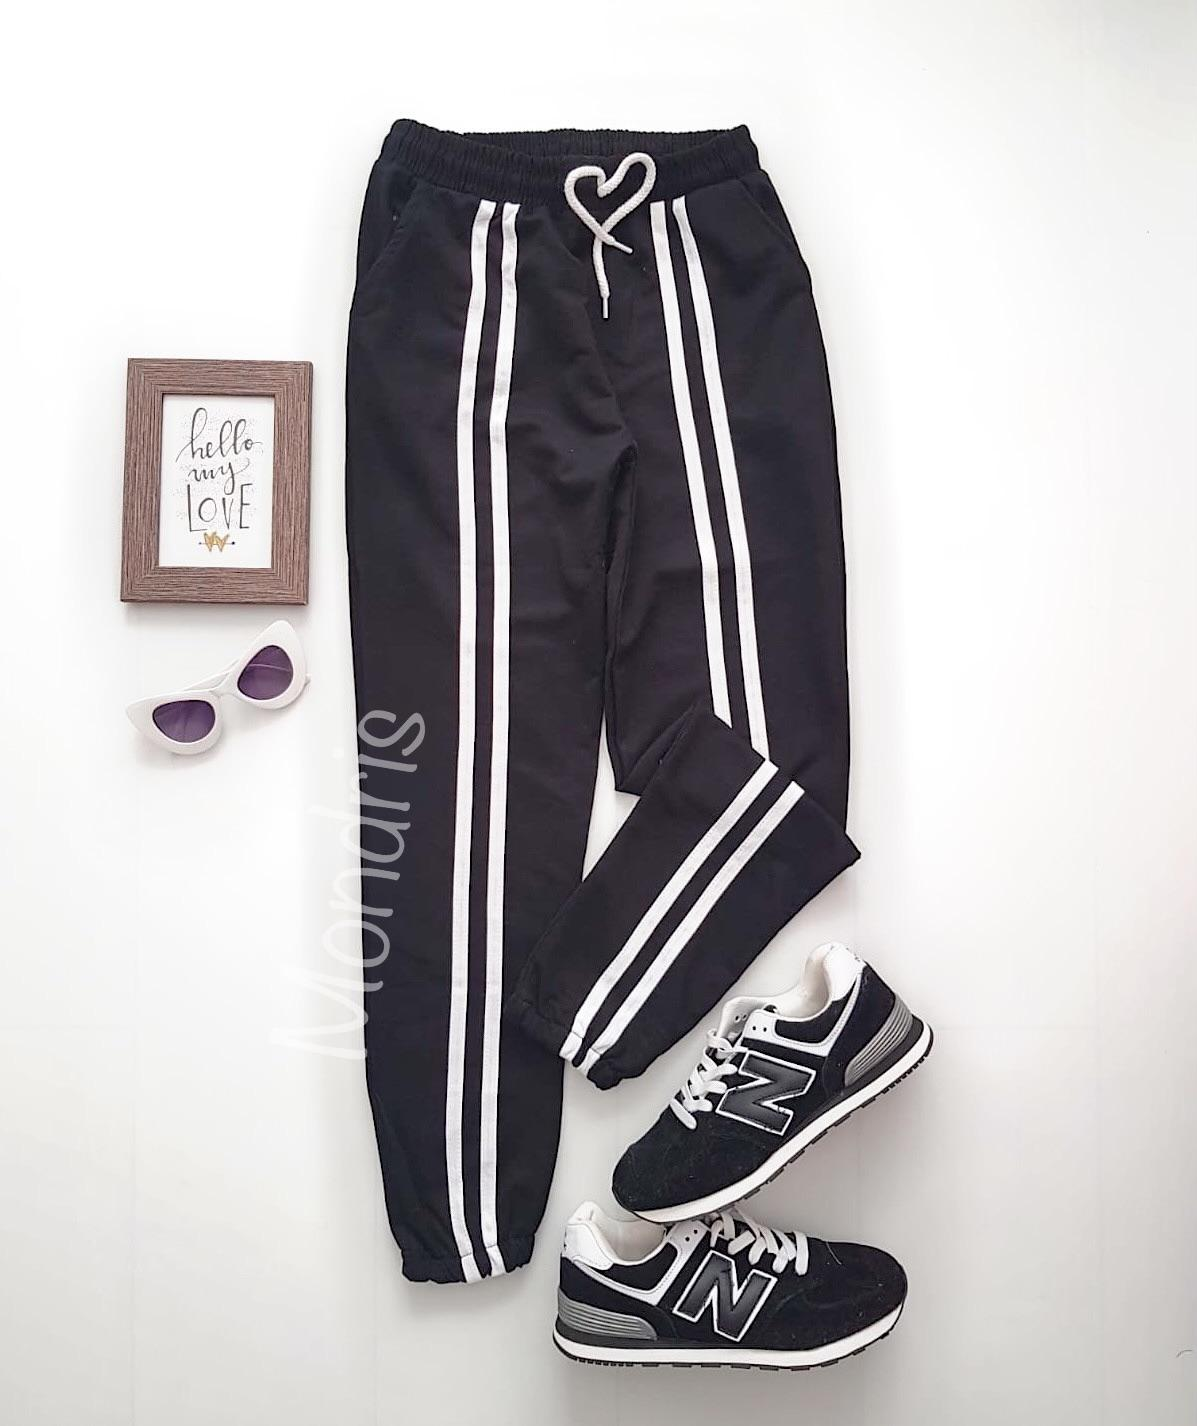 Pantaloni dama ieftini tip jogger negri cu dungi pe mijloc